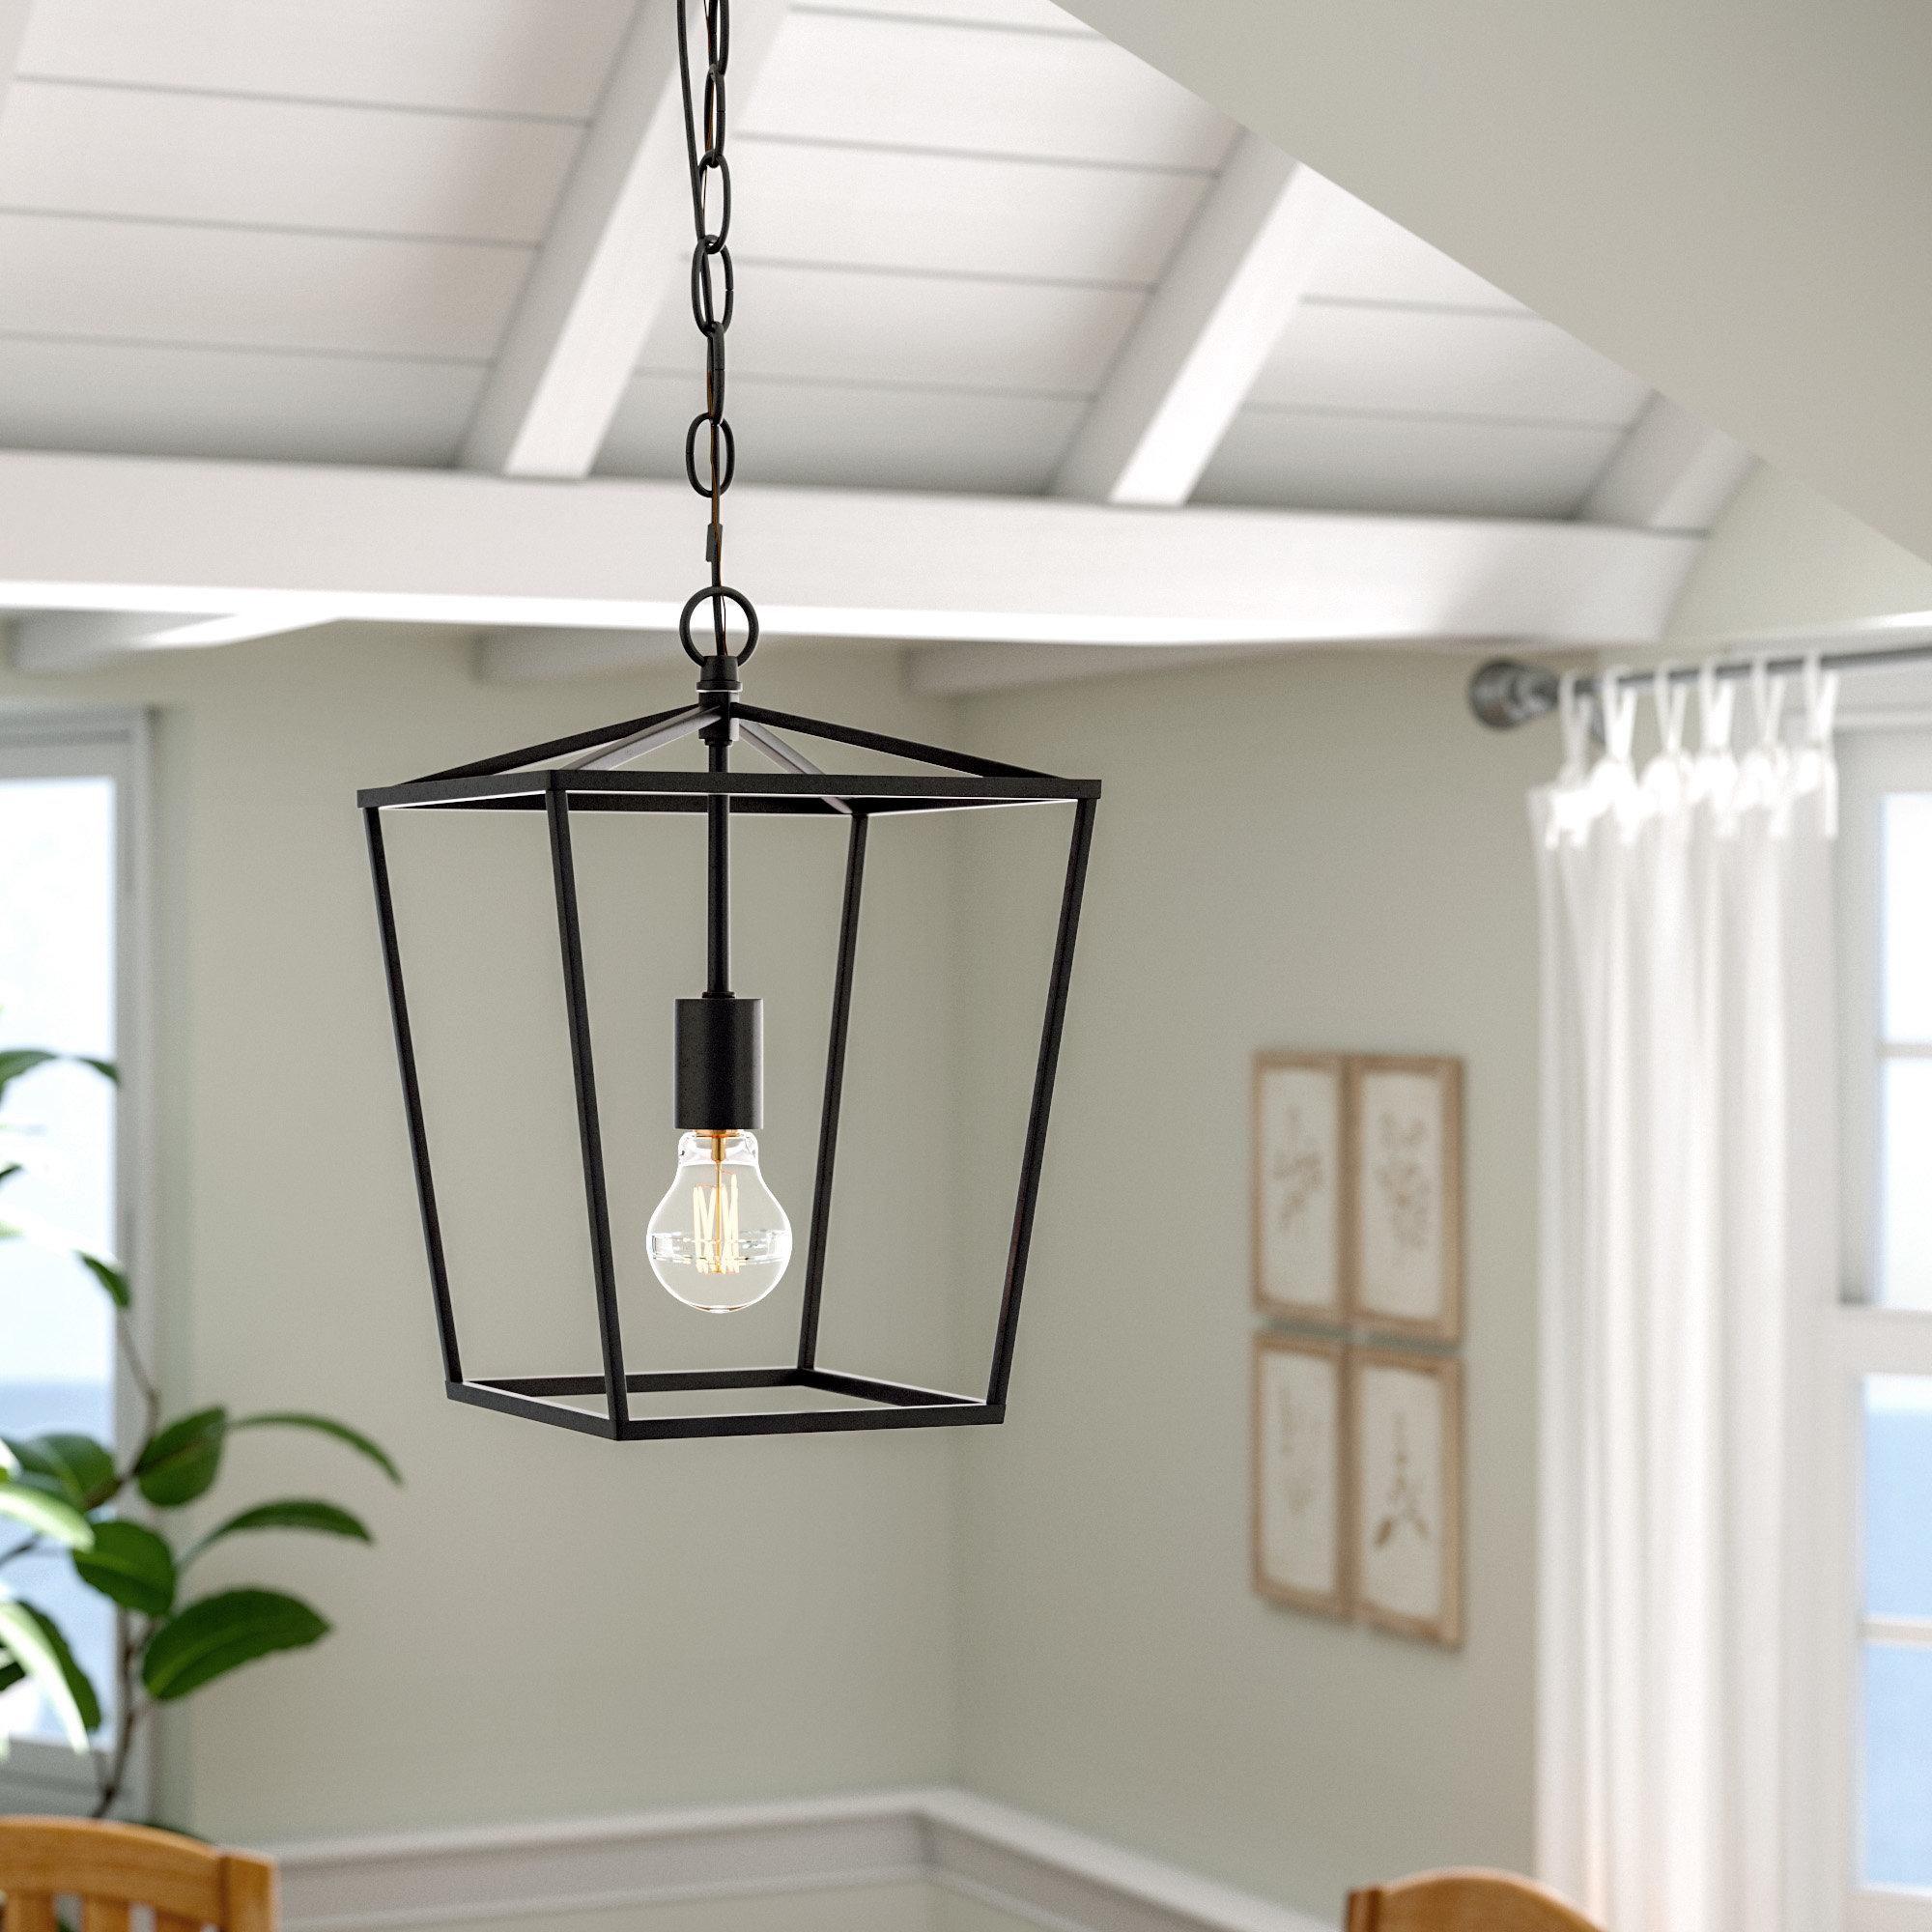 Most Recent Akash Industrial Vintage 1 Light Geometric Pendants Throughout Vintage Barn Lighting Pendant (View 14 of 20)